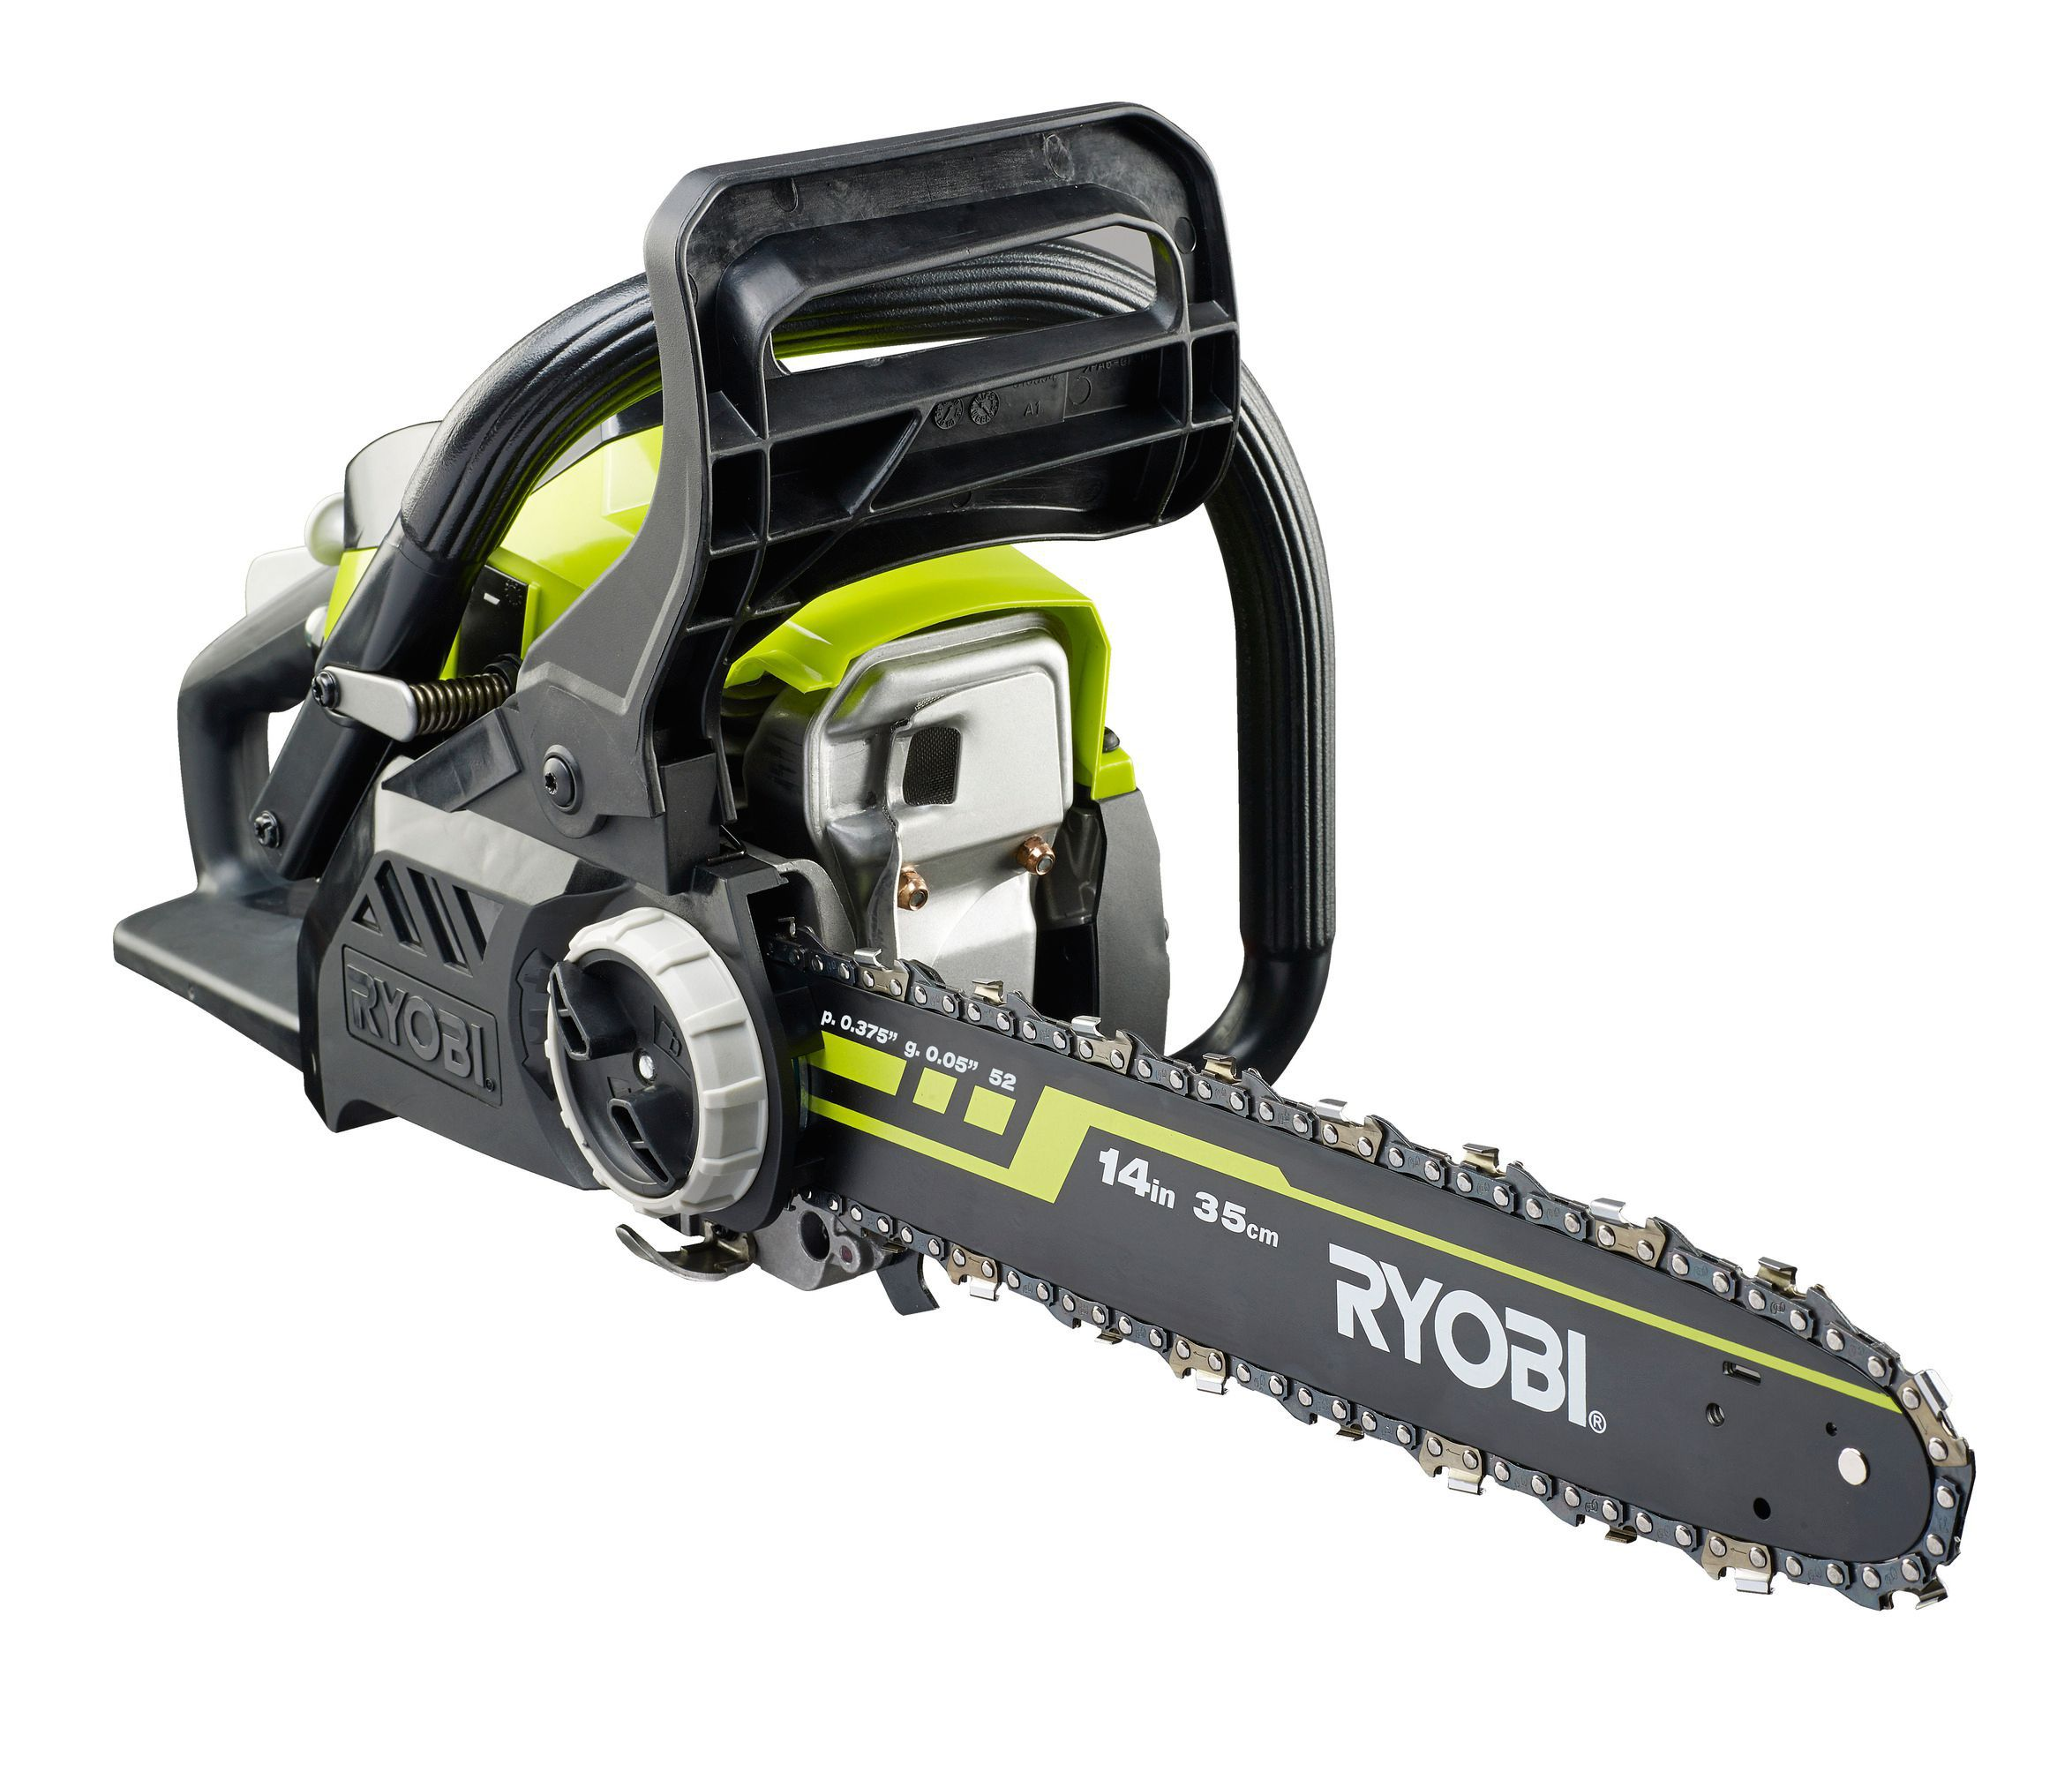 Ryobi Rcs3835t 37.2 Cc Cordless Petrol Chainsaw